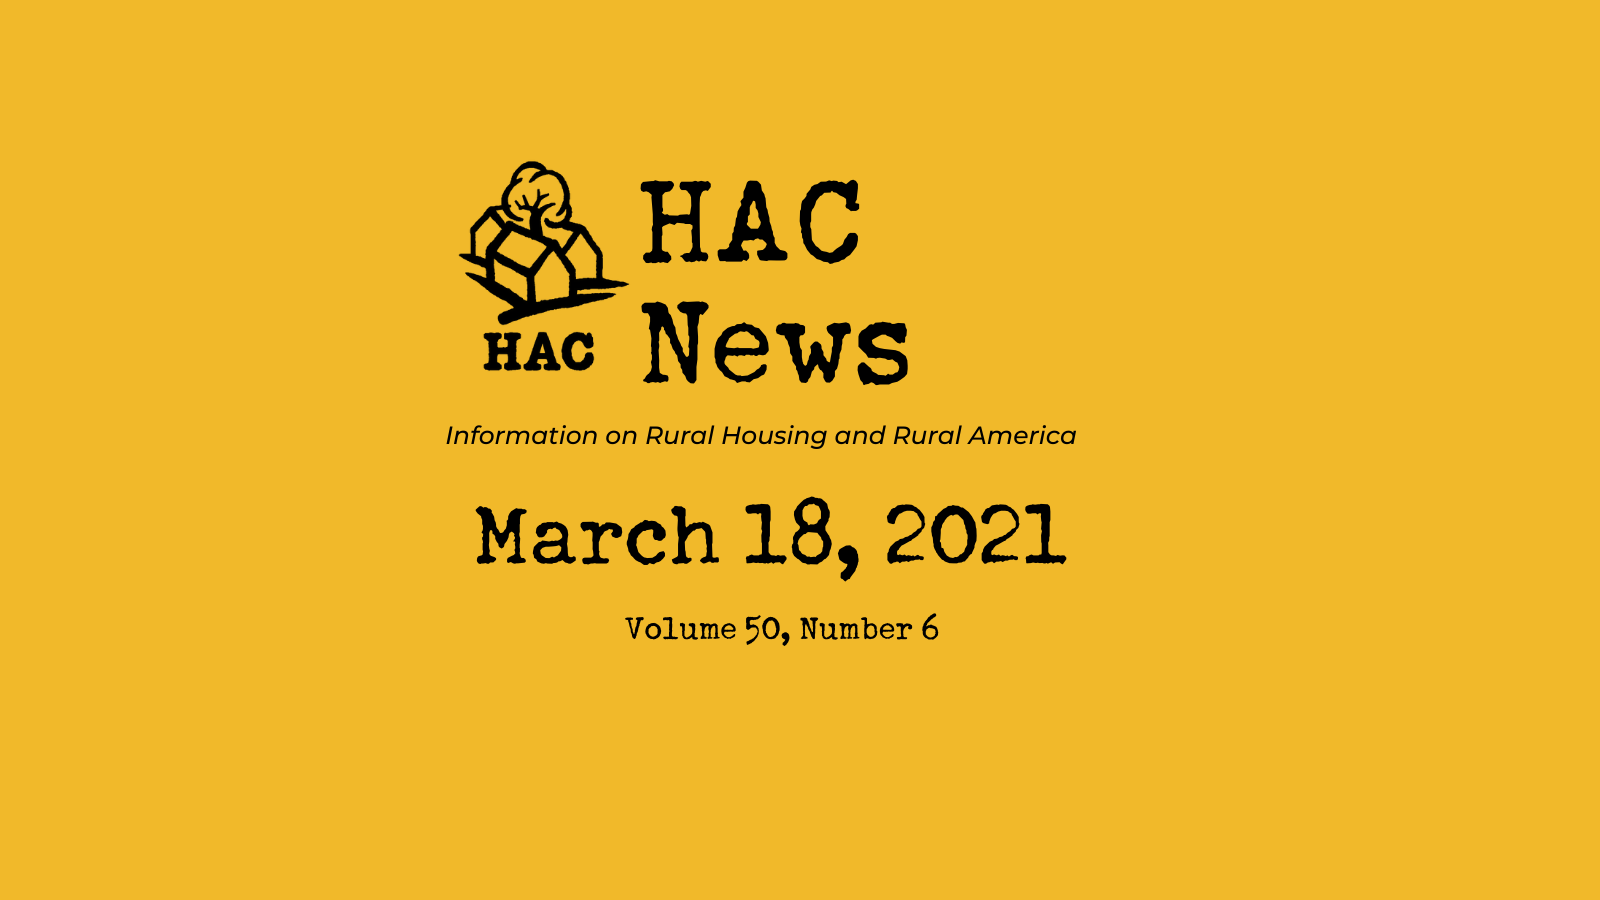 HAC News - 3/18/2021